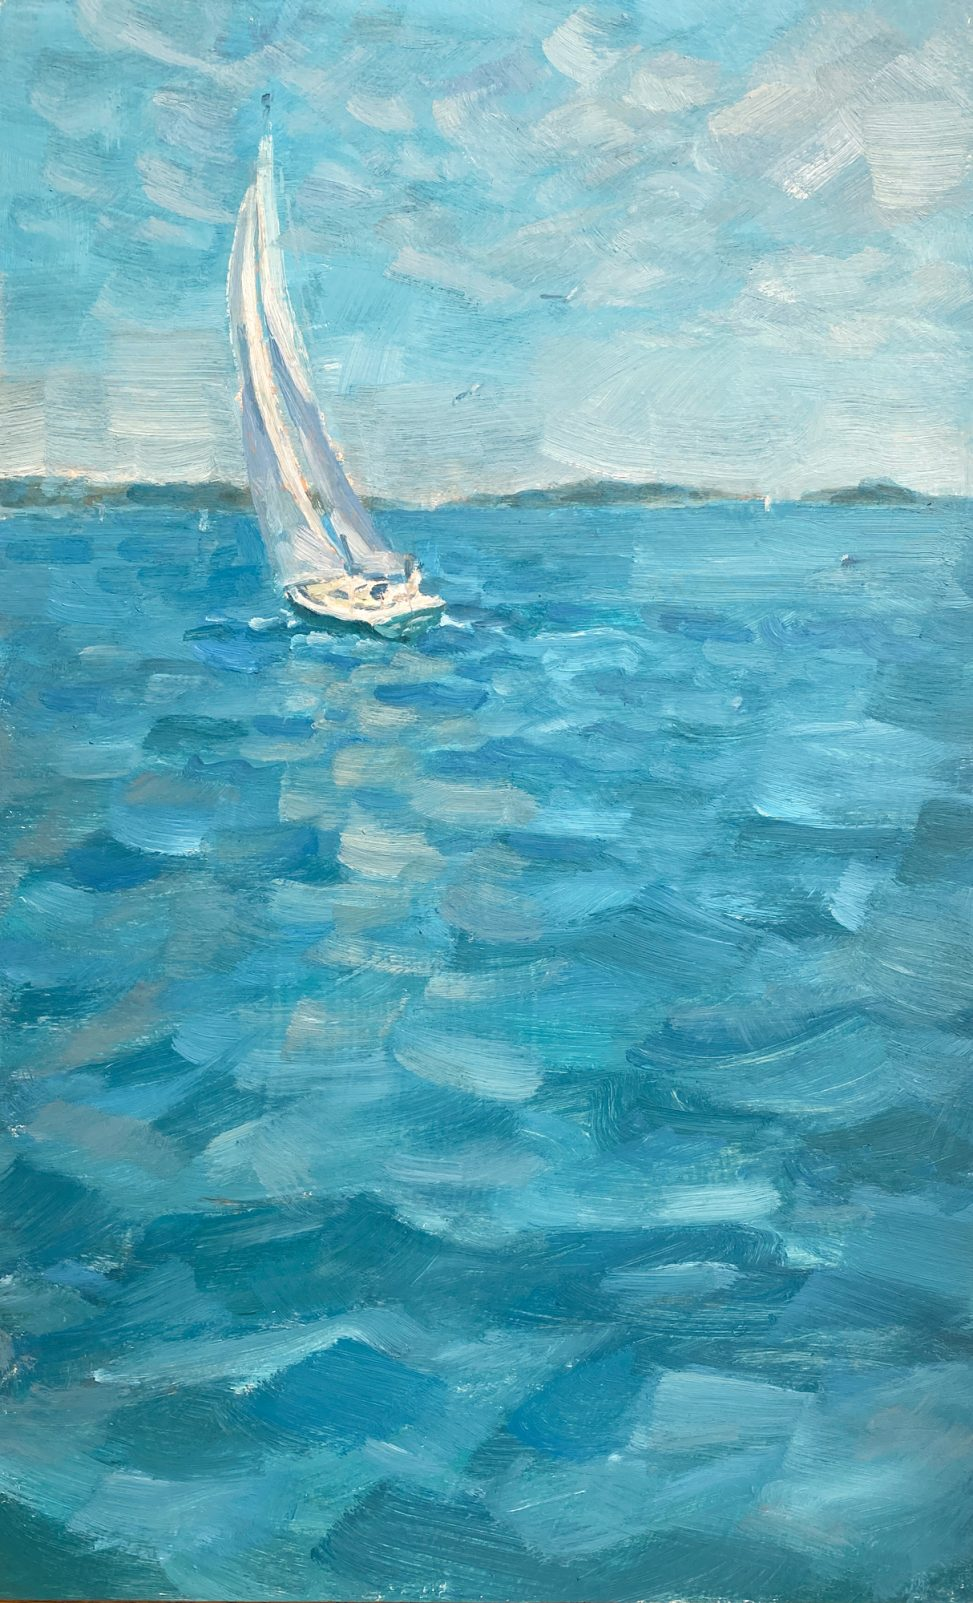 Painting of Sailboat in Salem Harbor